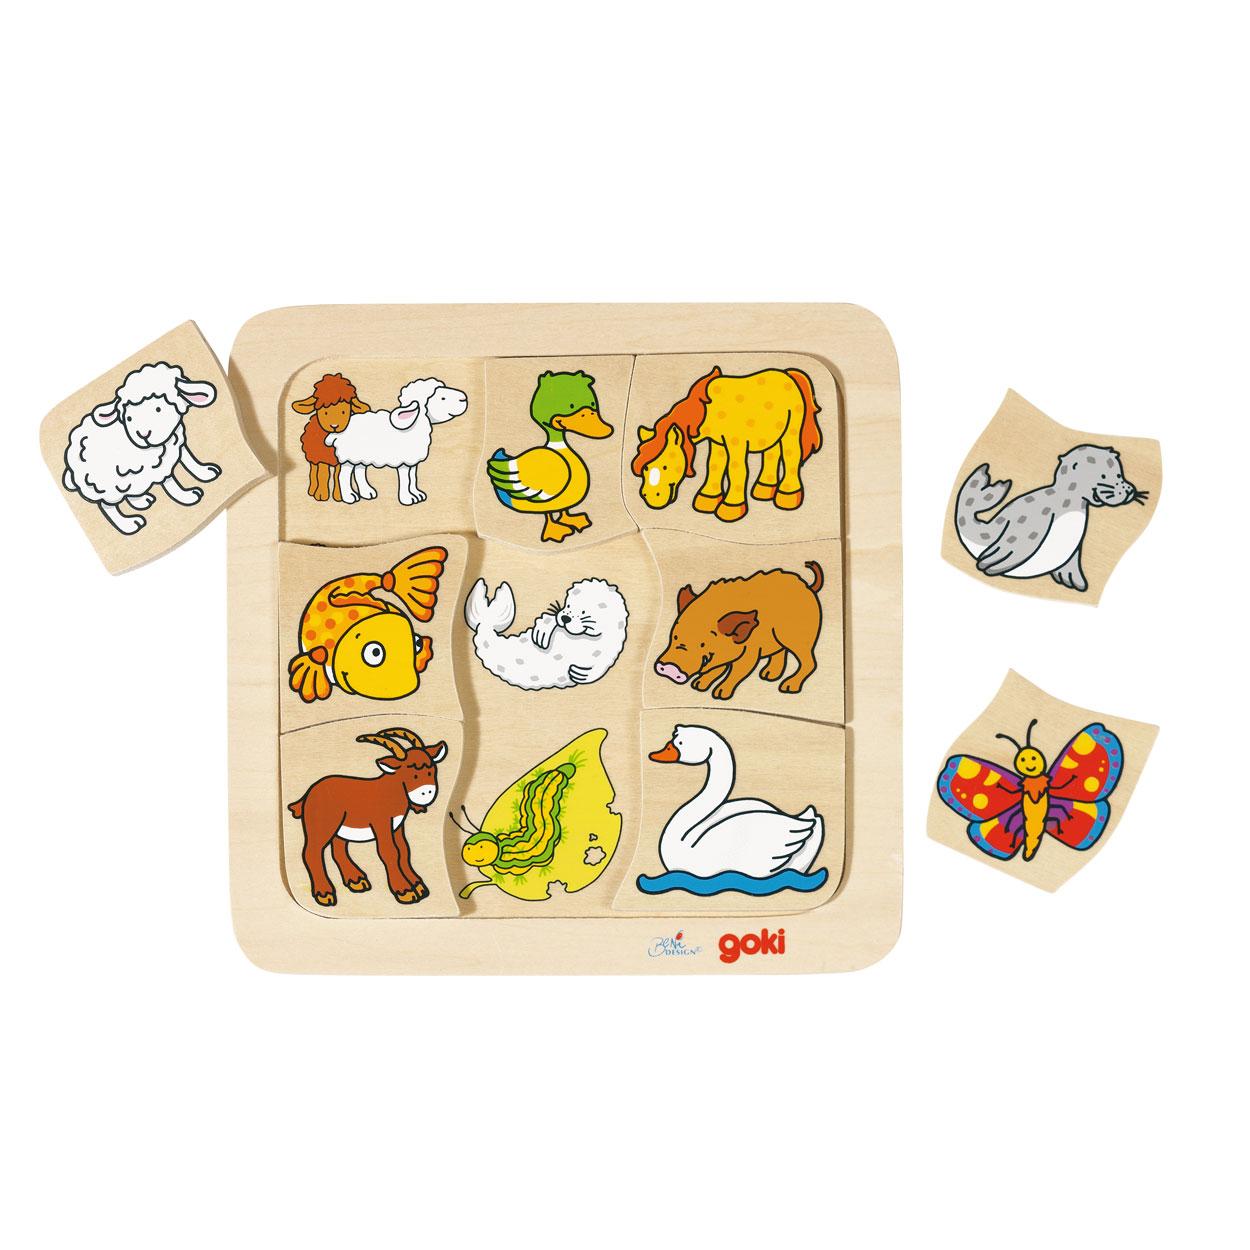 Goki vormenpuzzel 9 stuks